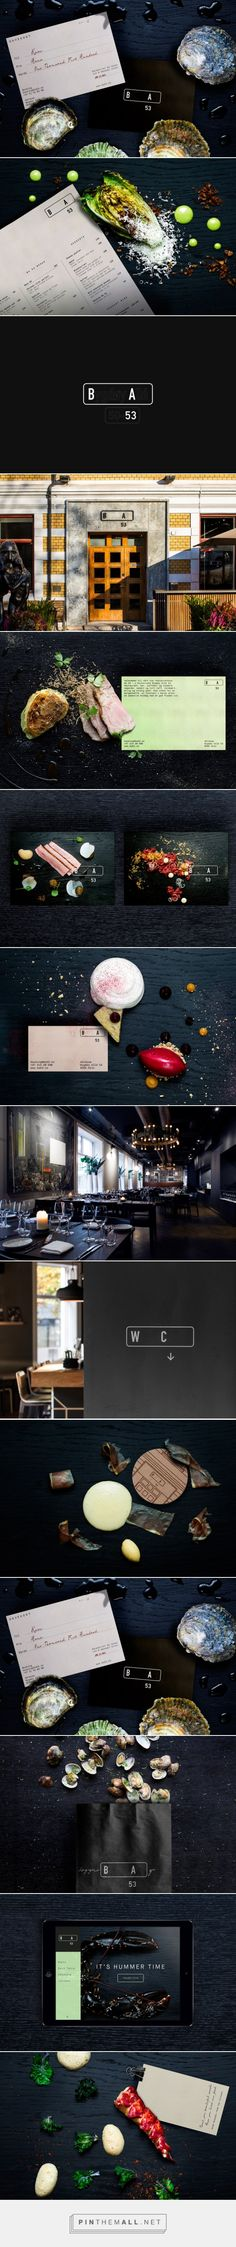 Modern Restaurant Branding Project for BA 53 by Nicklas Haslestad - created via https://pinthemall.net